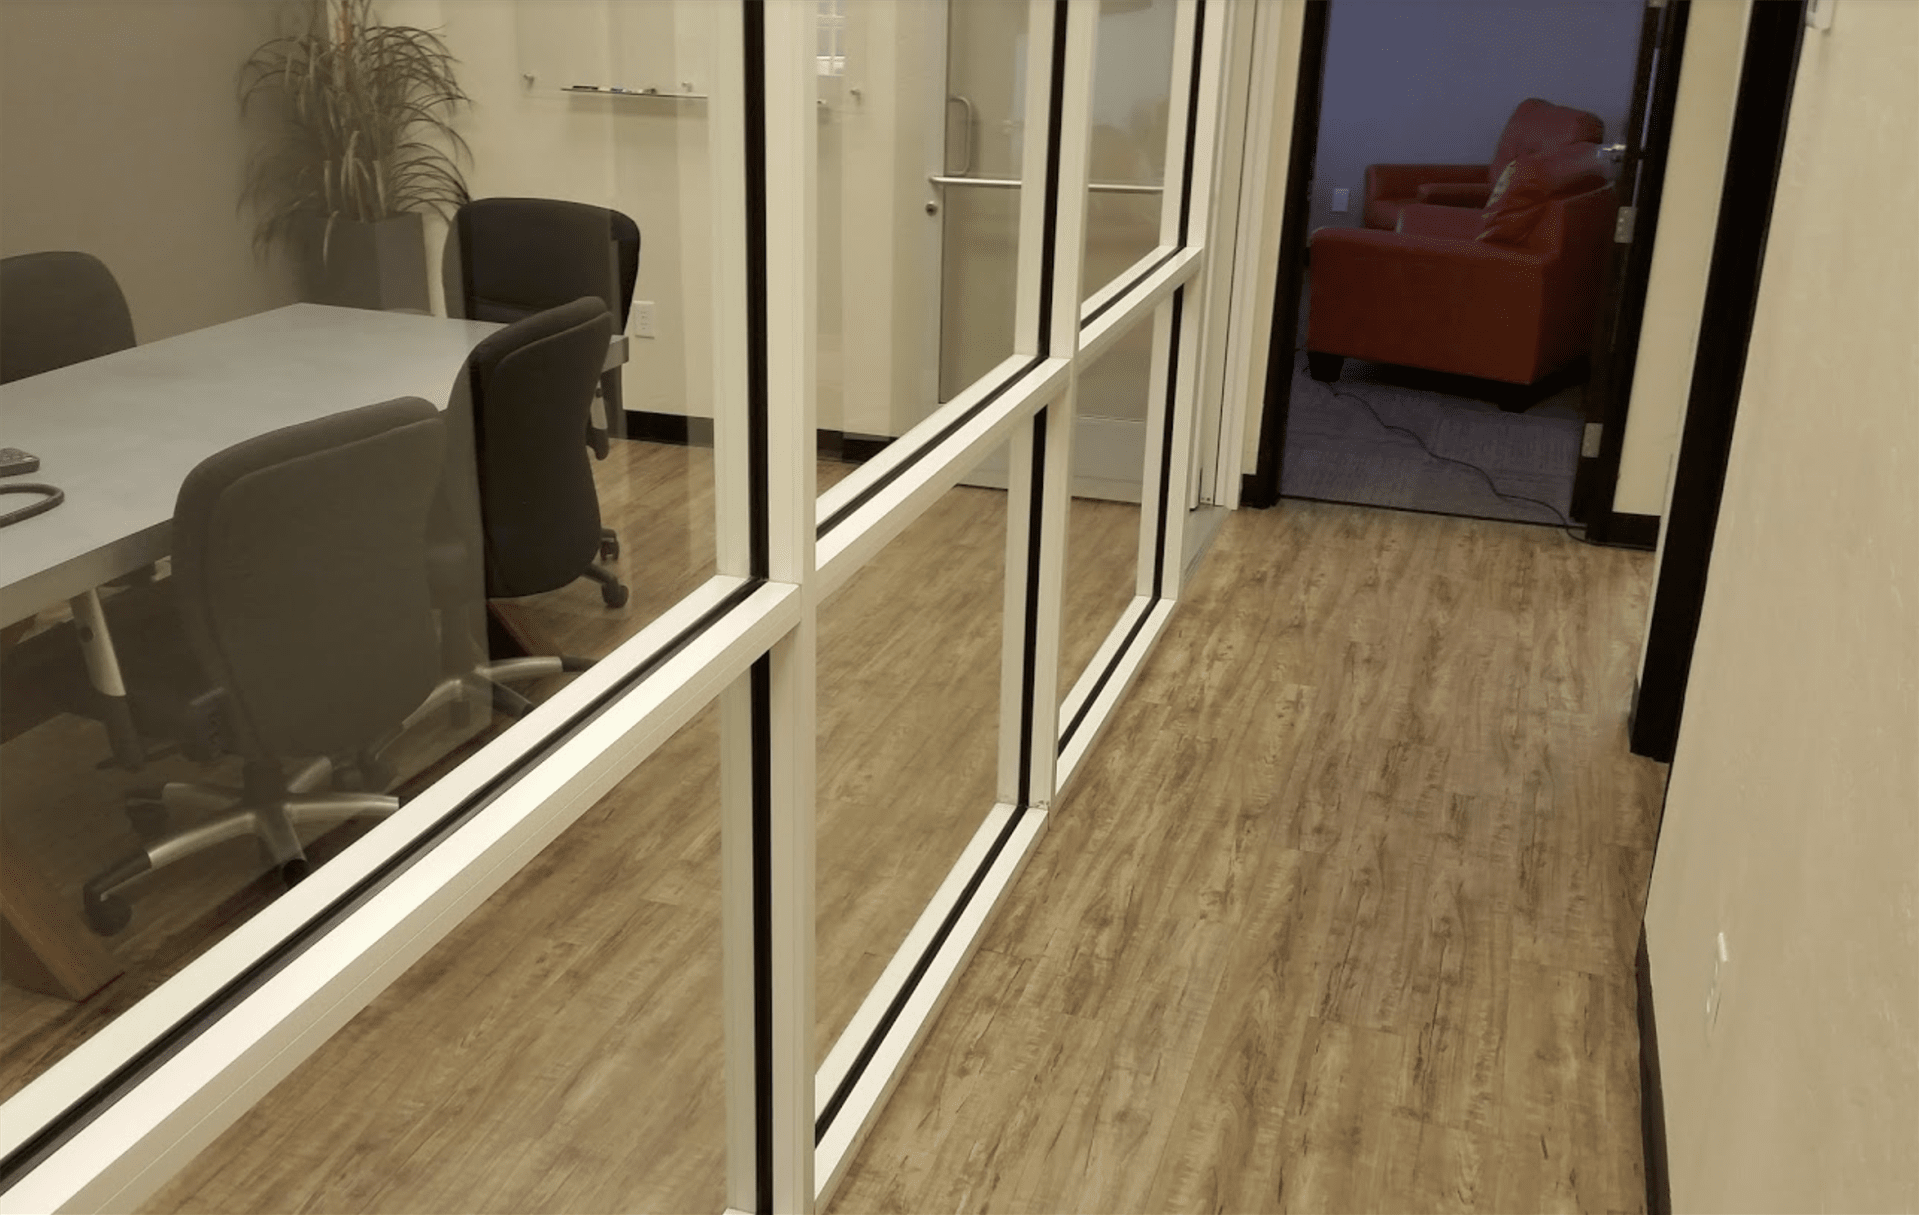 Laminate flooring from Taylors Flooring in Mesa, AZ